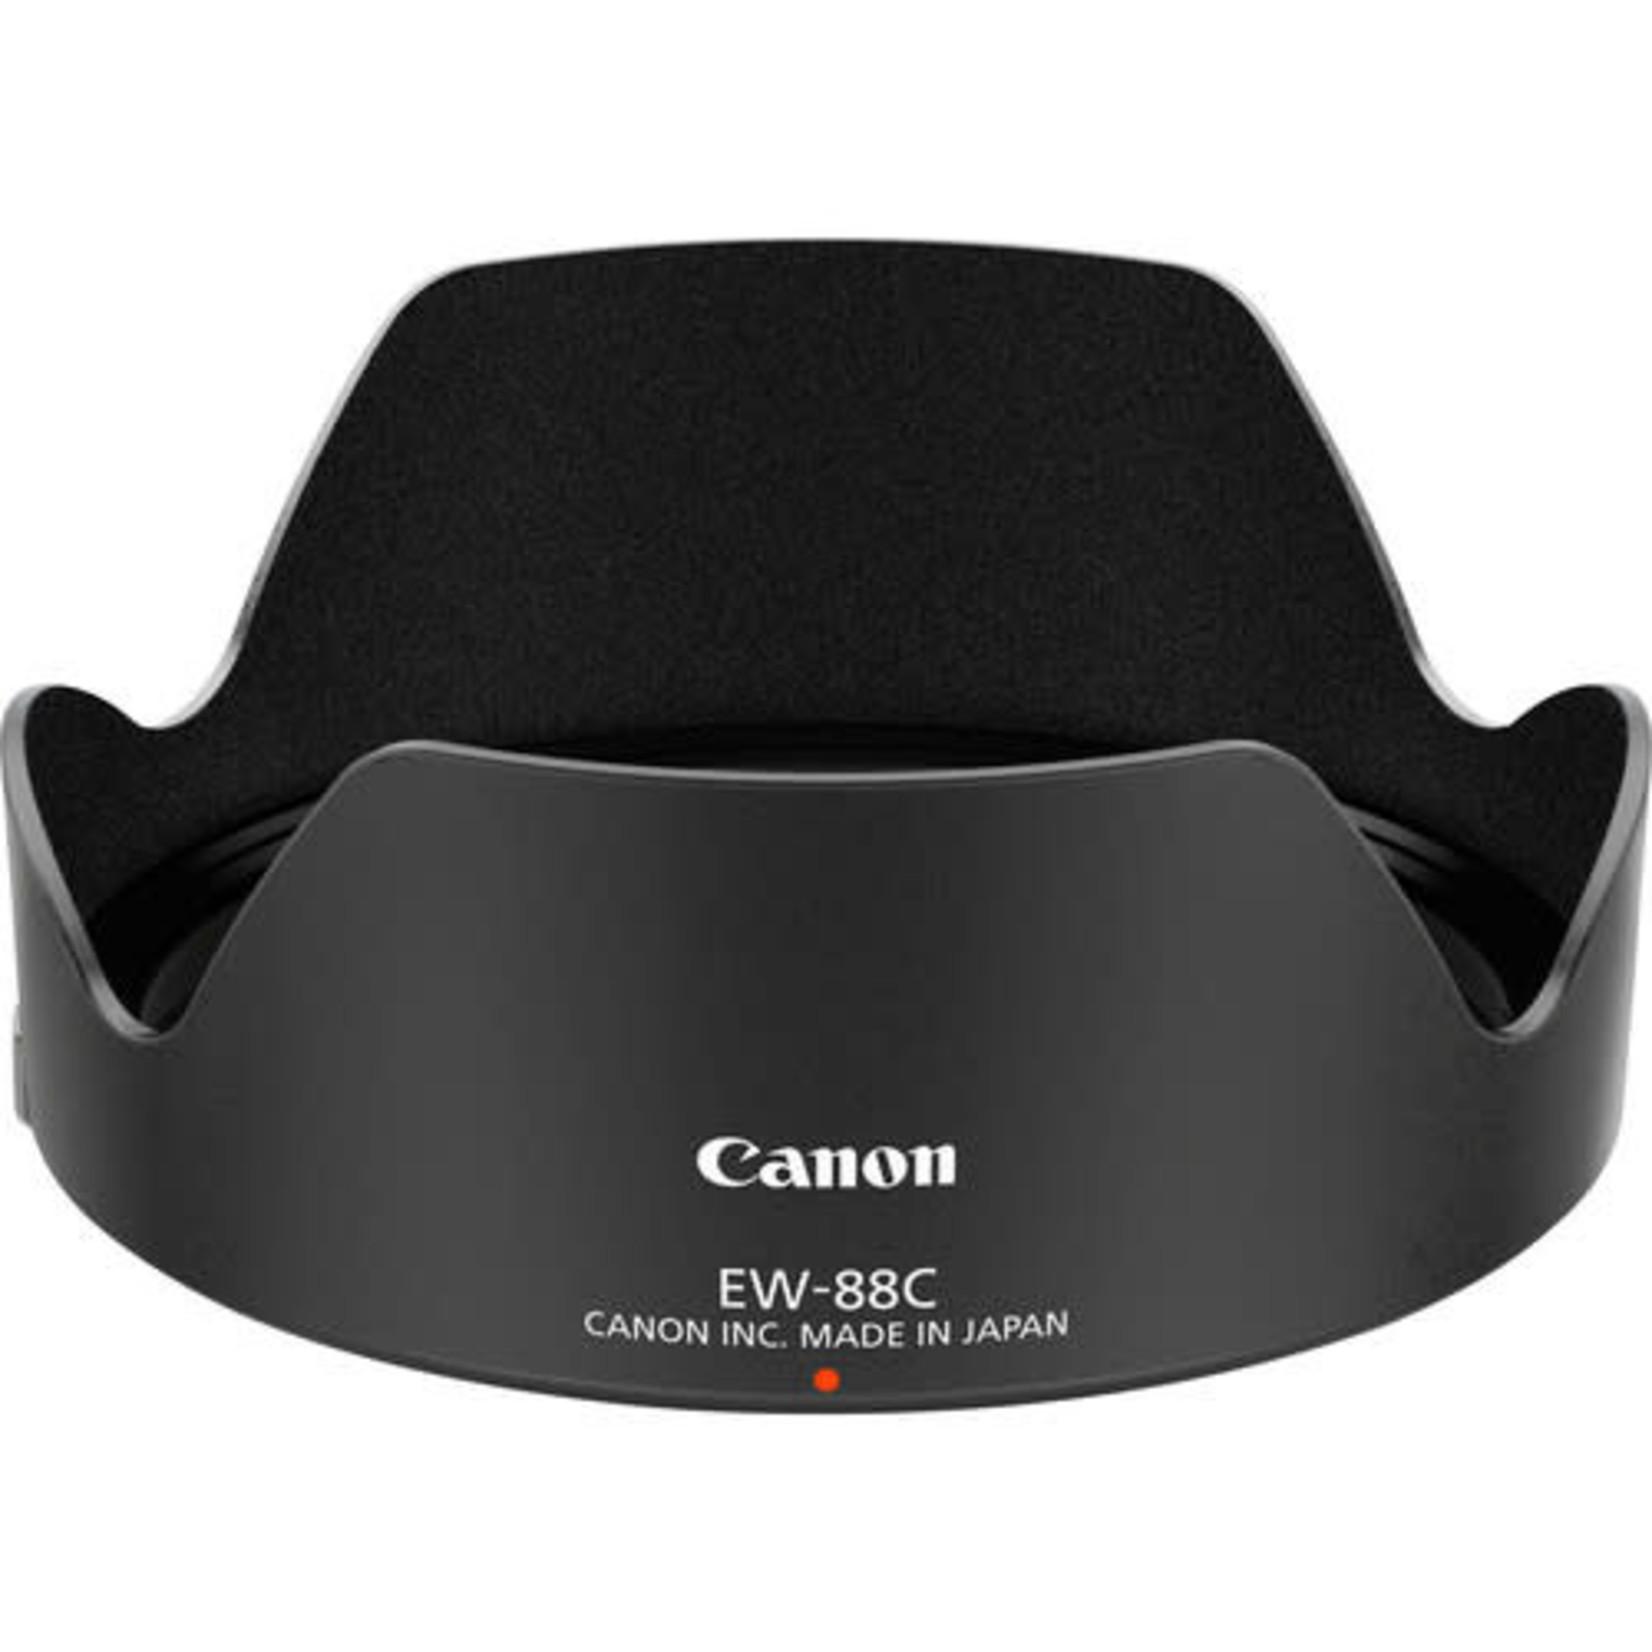 Canon Canon EW-88C Tulip Lens Hood for EF 24-70mm f/2.8L II USM Lens